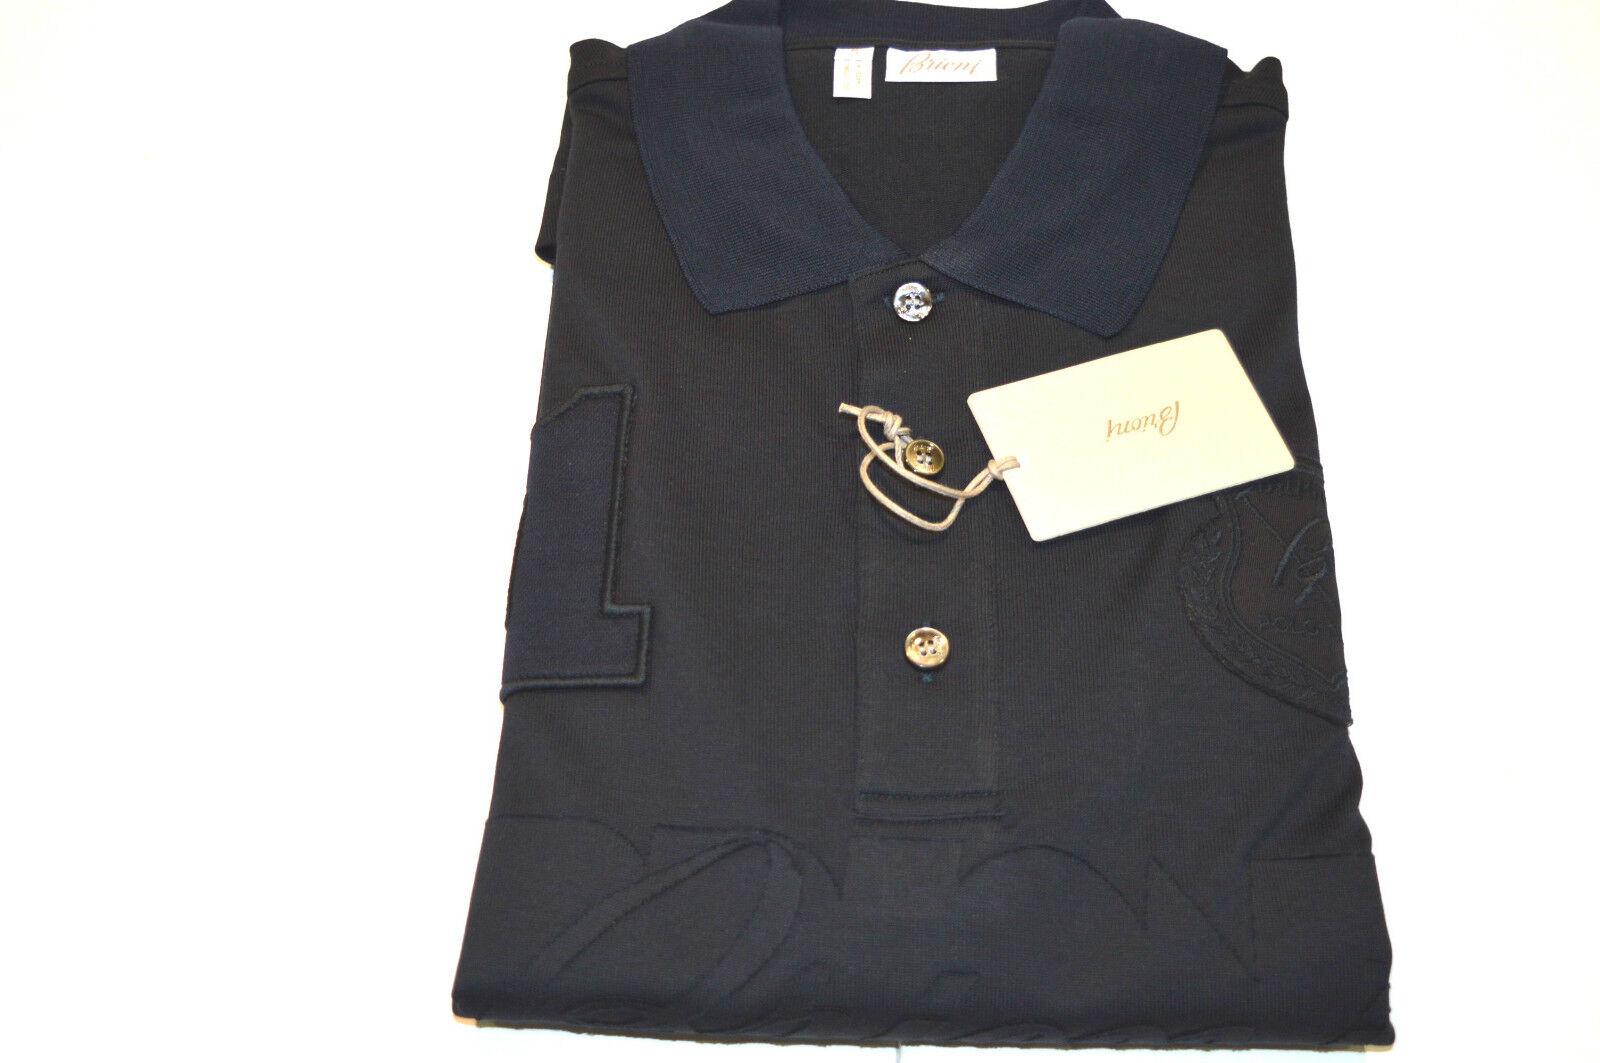 NEW BRIONI  Polo 100% Cotton  Long sleeve  Größe XL Us 54 Eu (Cod stemmC)